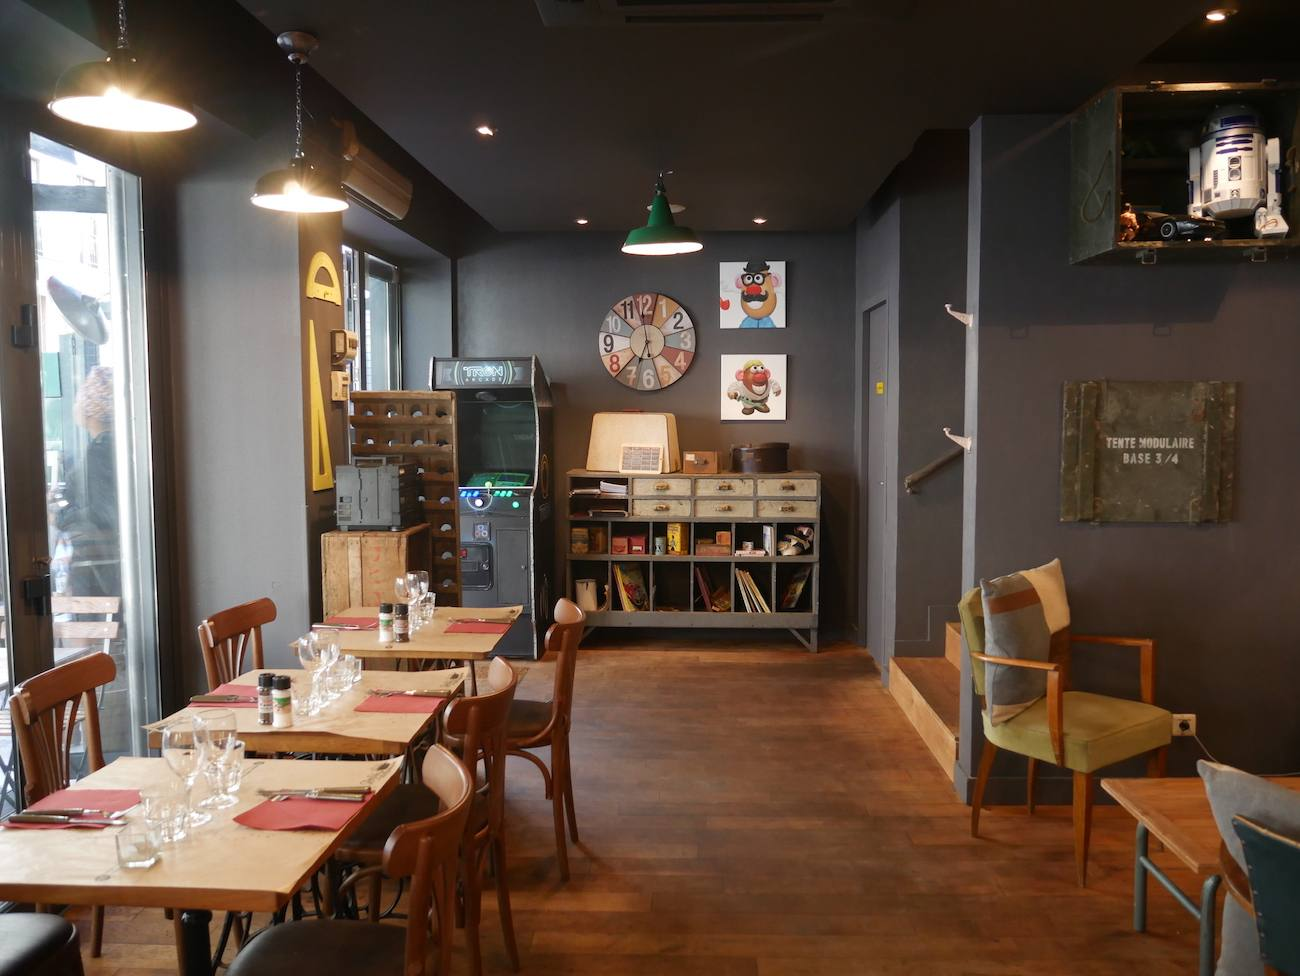 Restaurant Nantes - Les fils à maman - blog Nolwenn 8